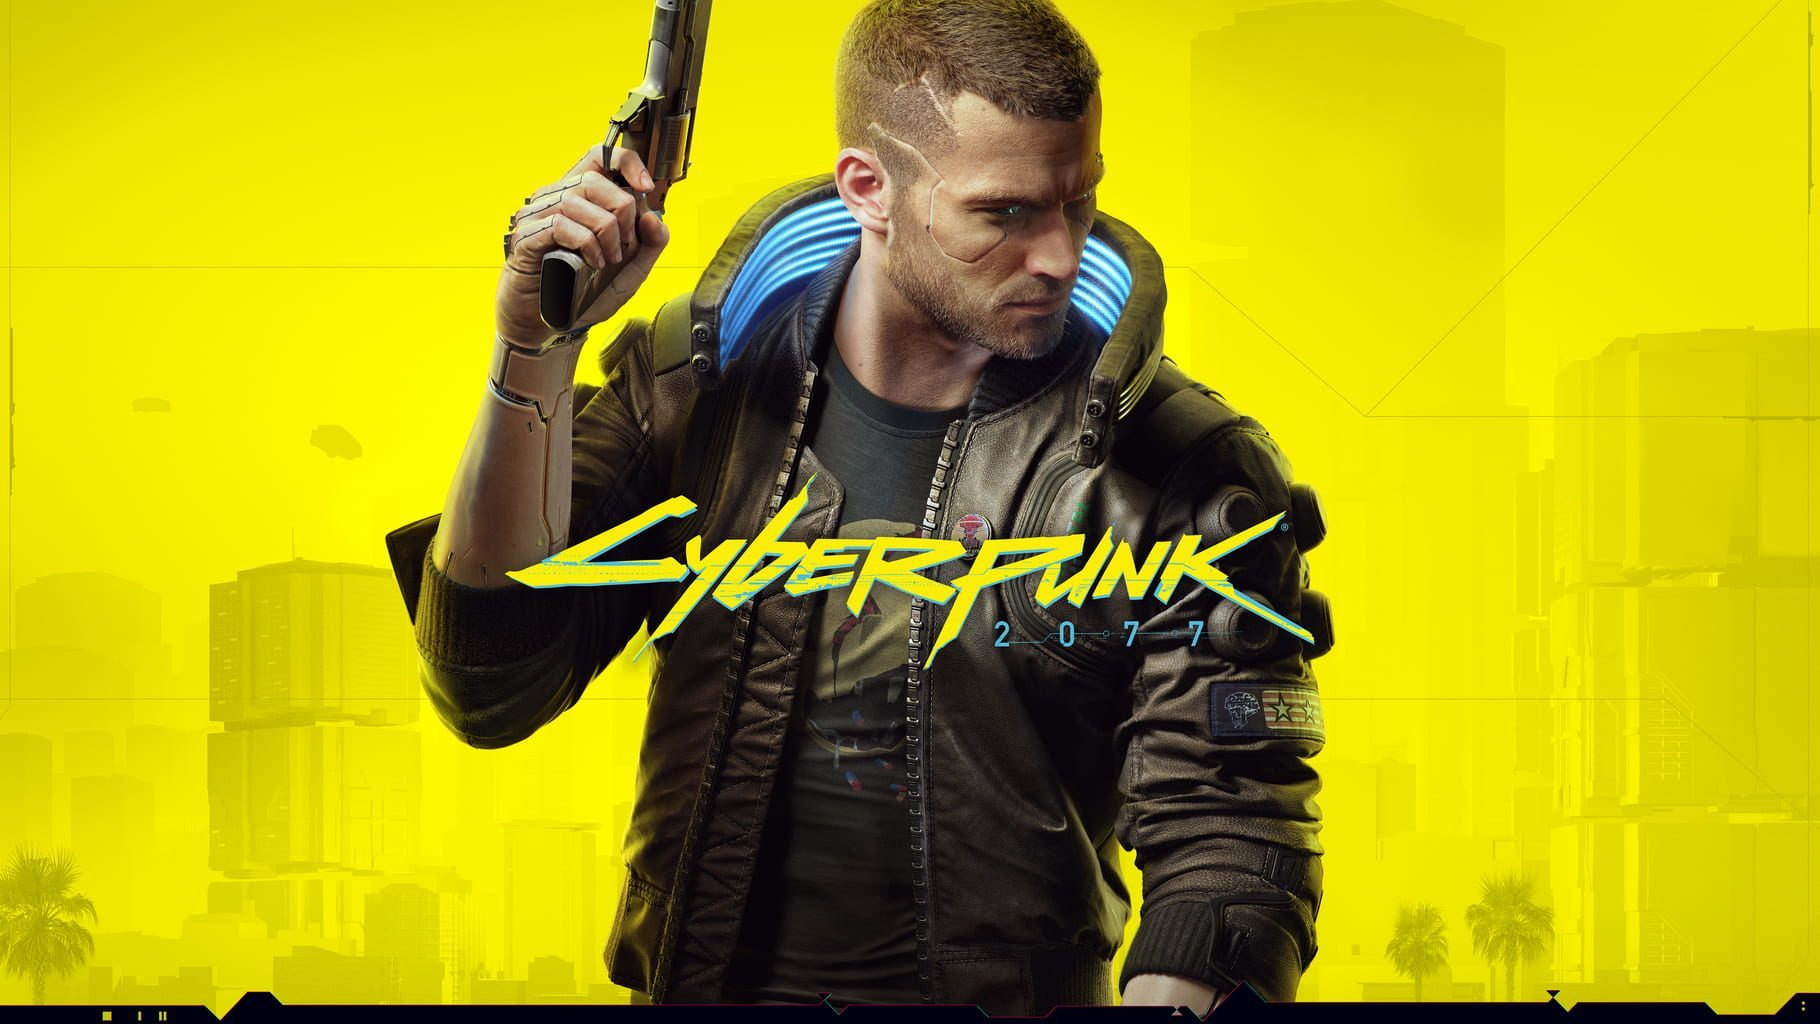 Cyberpunk 2077 logo and artwork